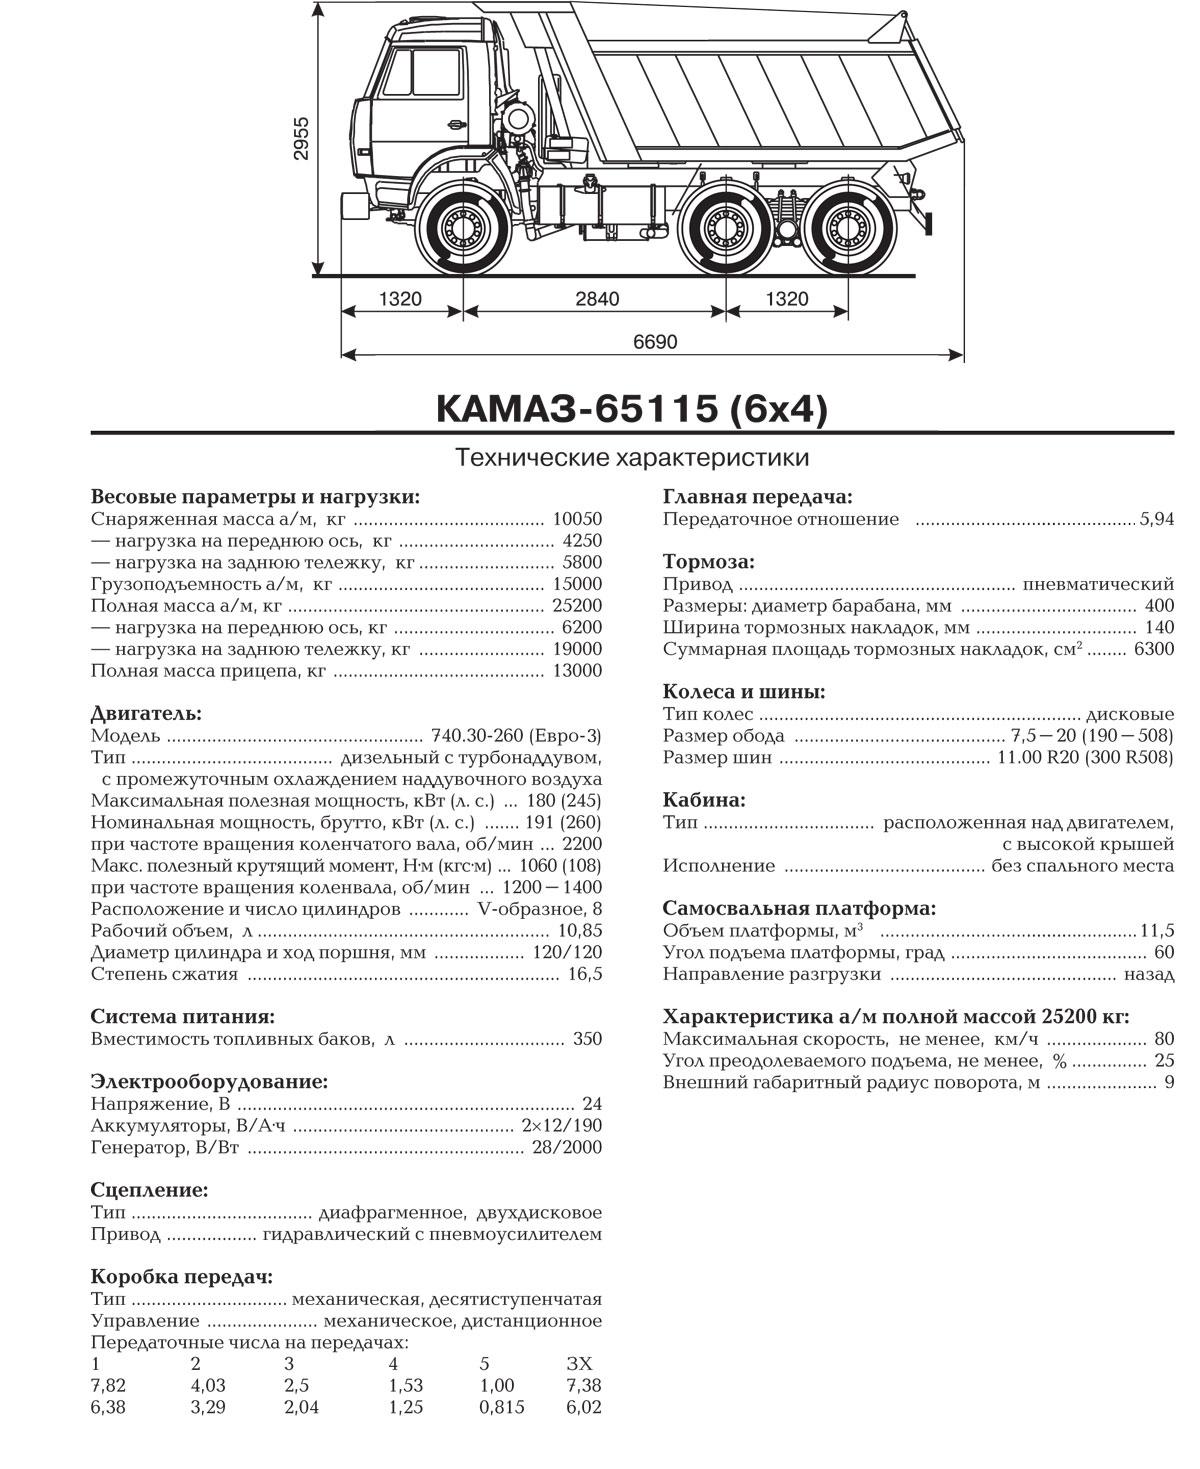 Габаритная схема самосвала КамАЗ-65115.